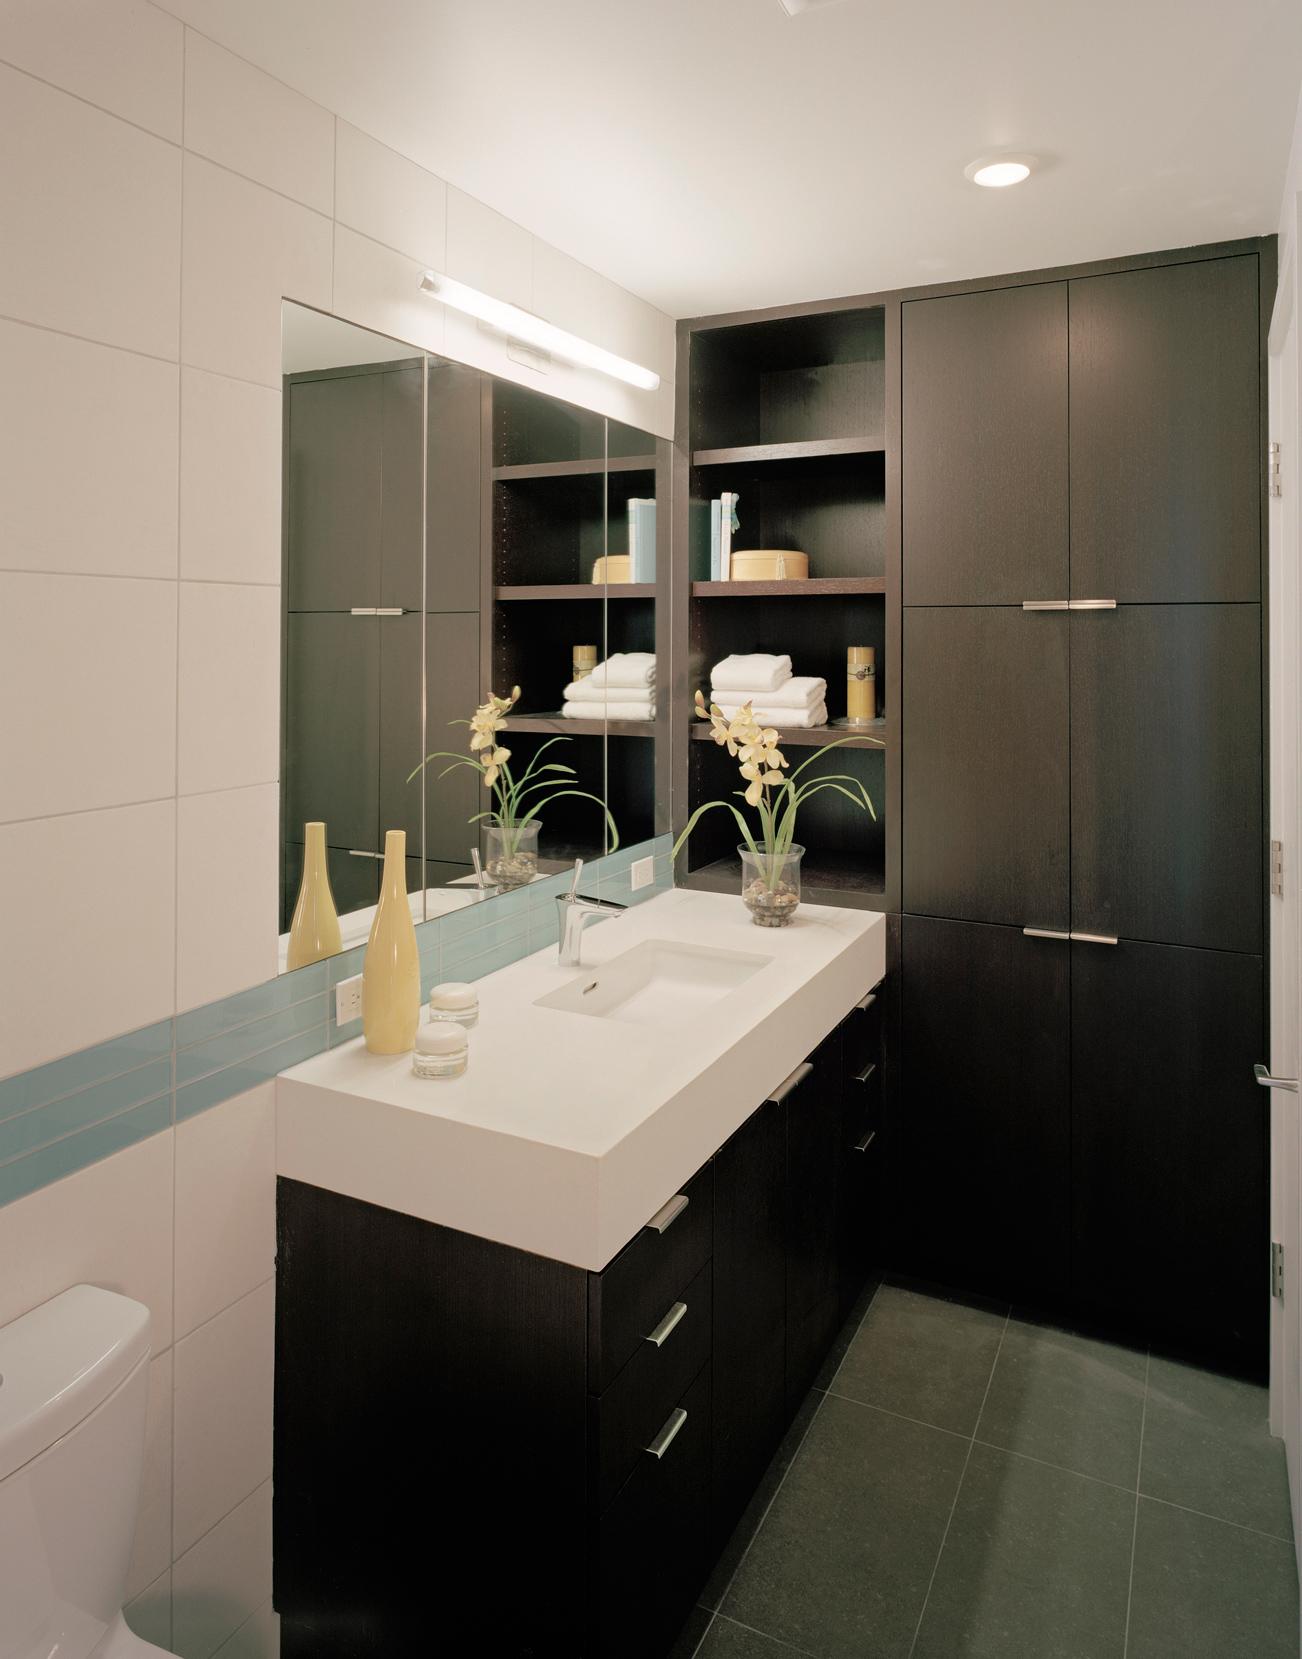 guest bathroom in new modern home.jpg